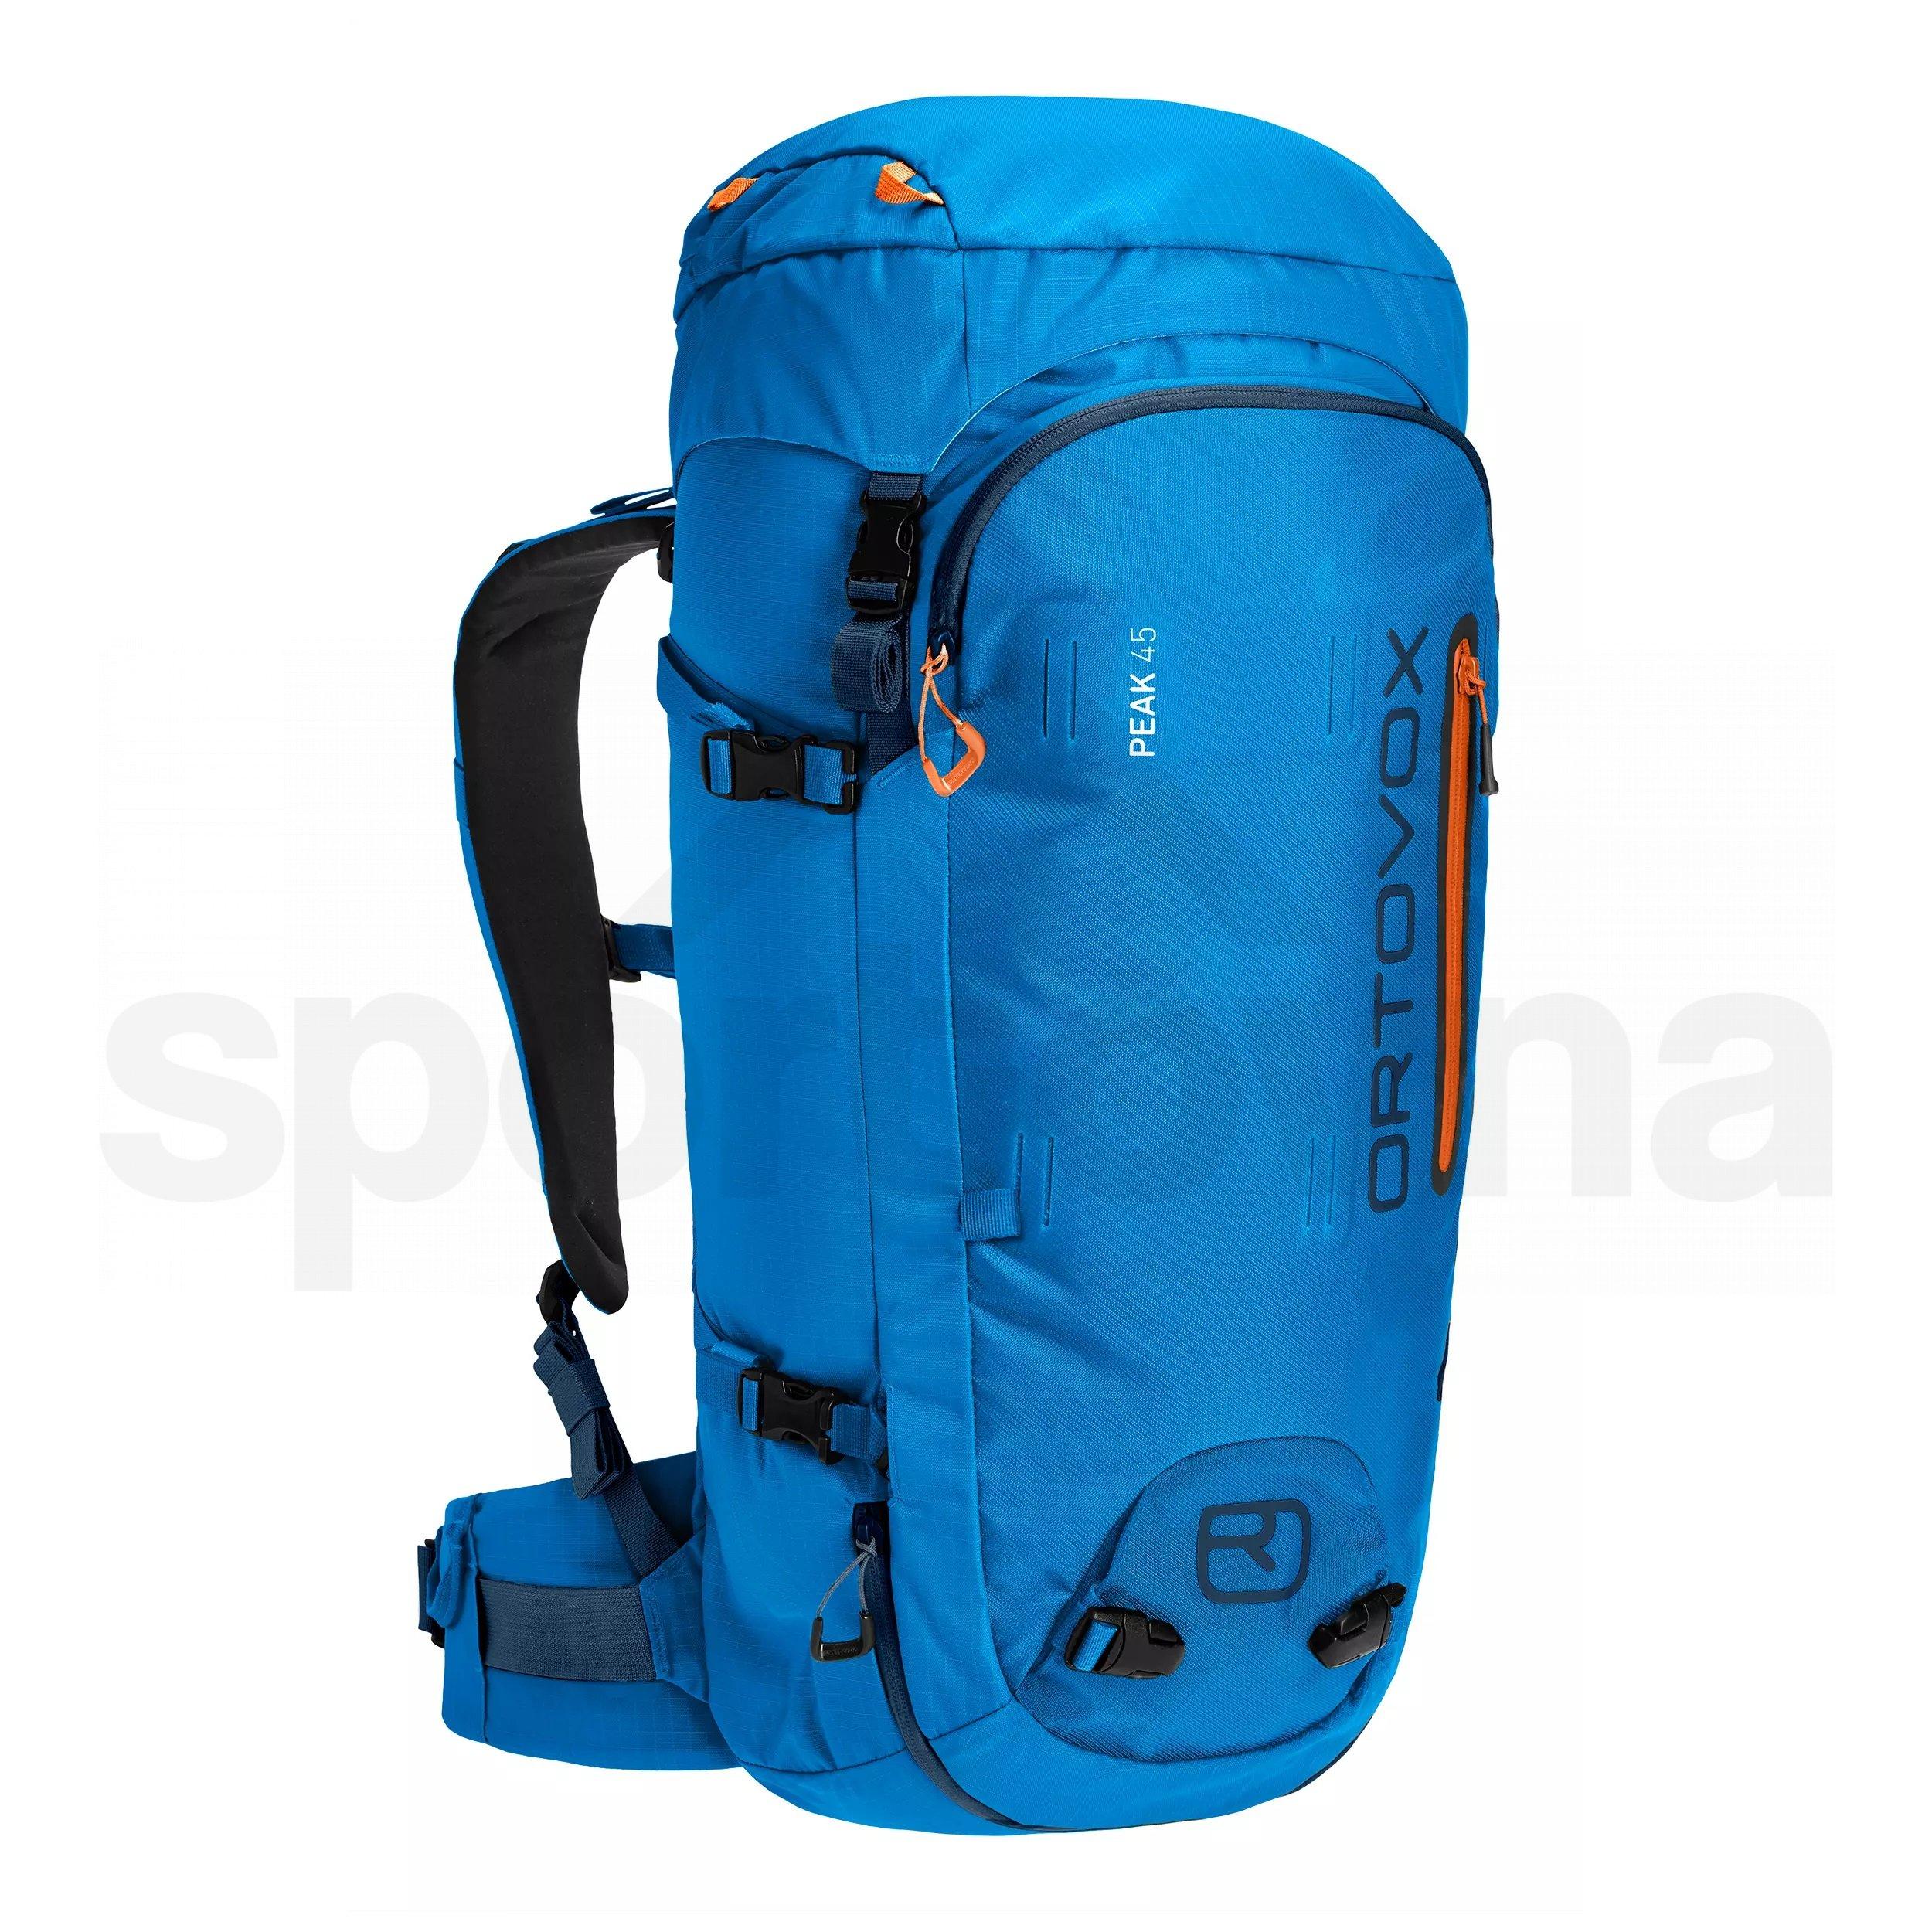 HIGH-ALPINE-PEAK-45-46422-safety-blue-WebRes